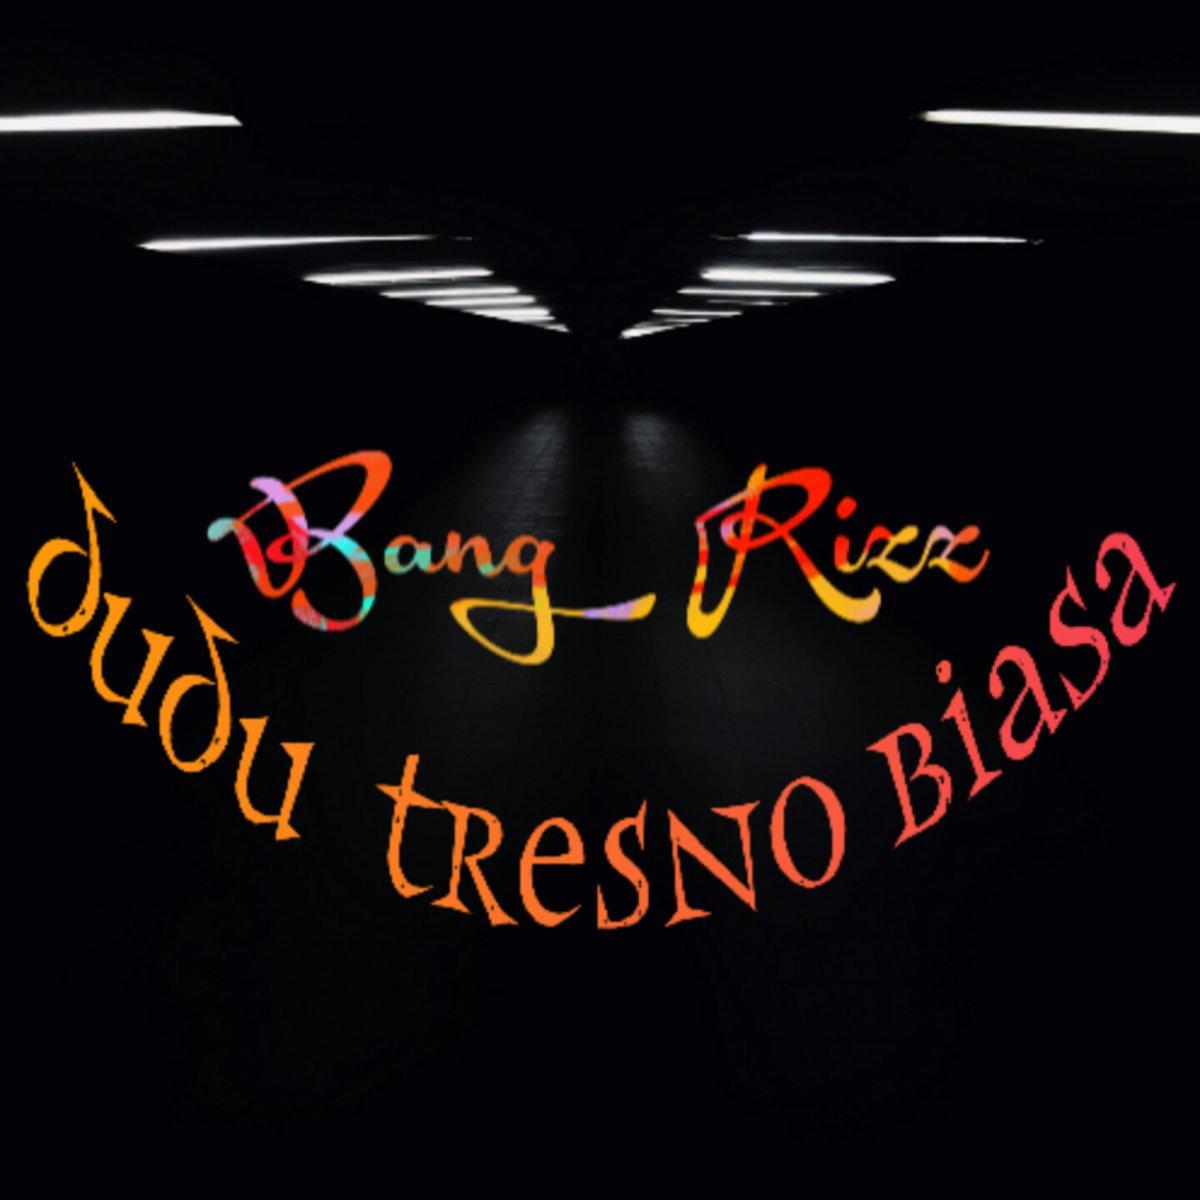 "New released ""Dudu Tresno Biasa"" by BANG RIZZ    #newrelease #werdimedia #werdimediamusic #spotify #itunes #deezer #youtubemusic #amazonmusic #tidal #langitmusik #joox #tiktok #napster #applemusic"